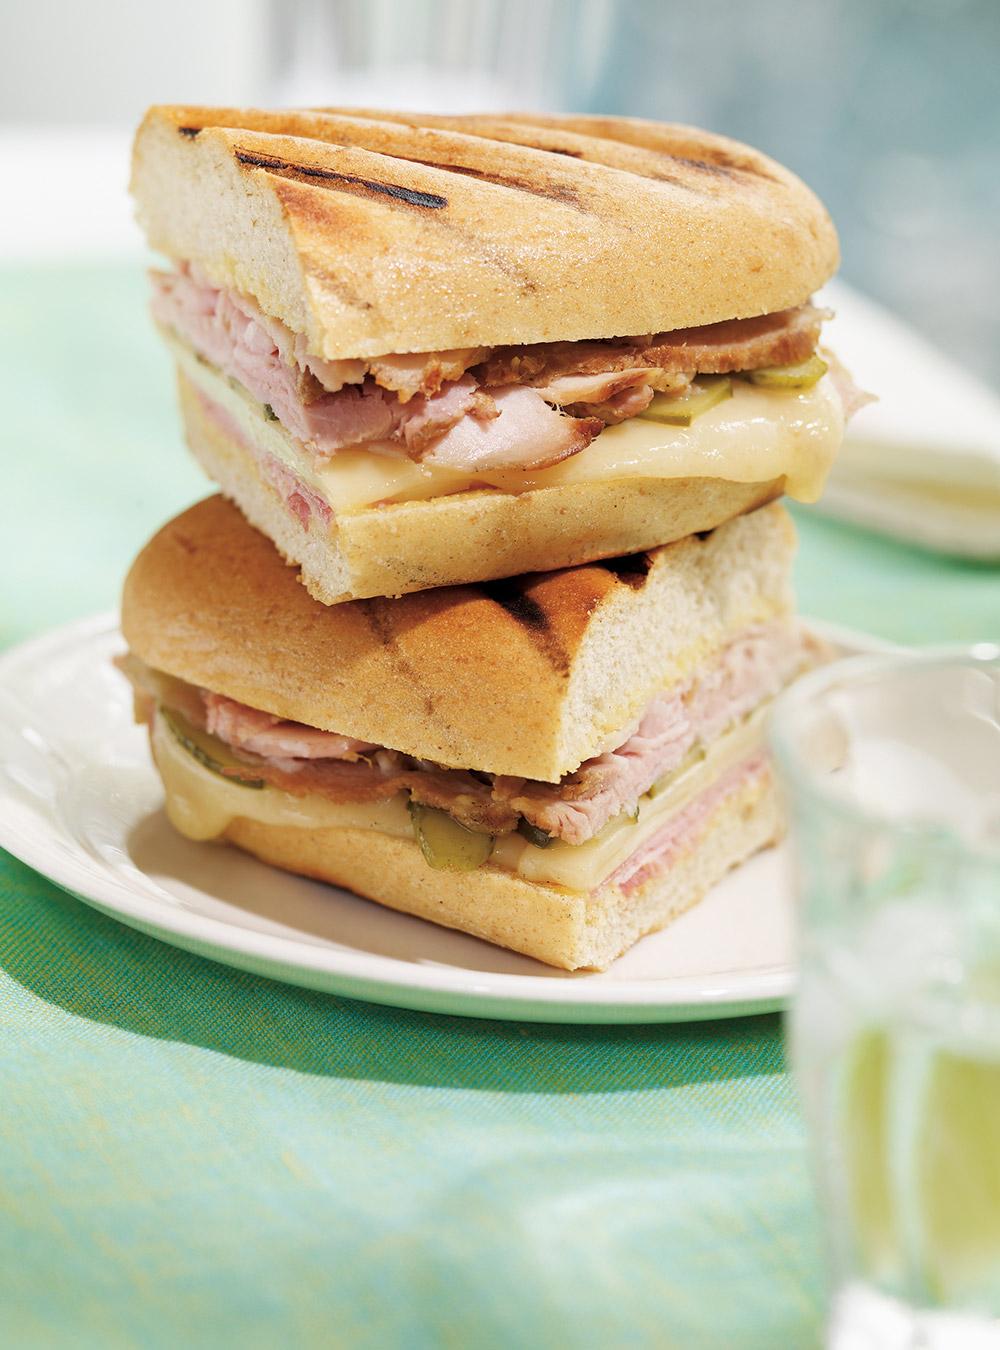 Sandwichs cubains | ricardo